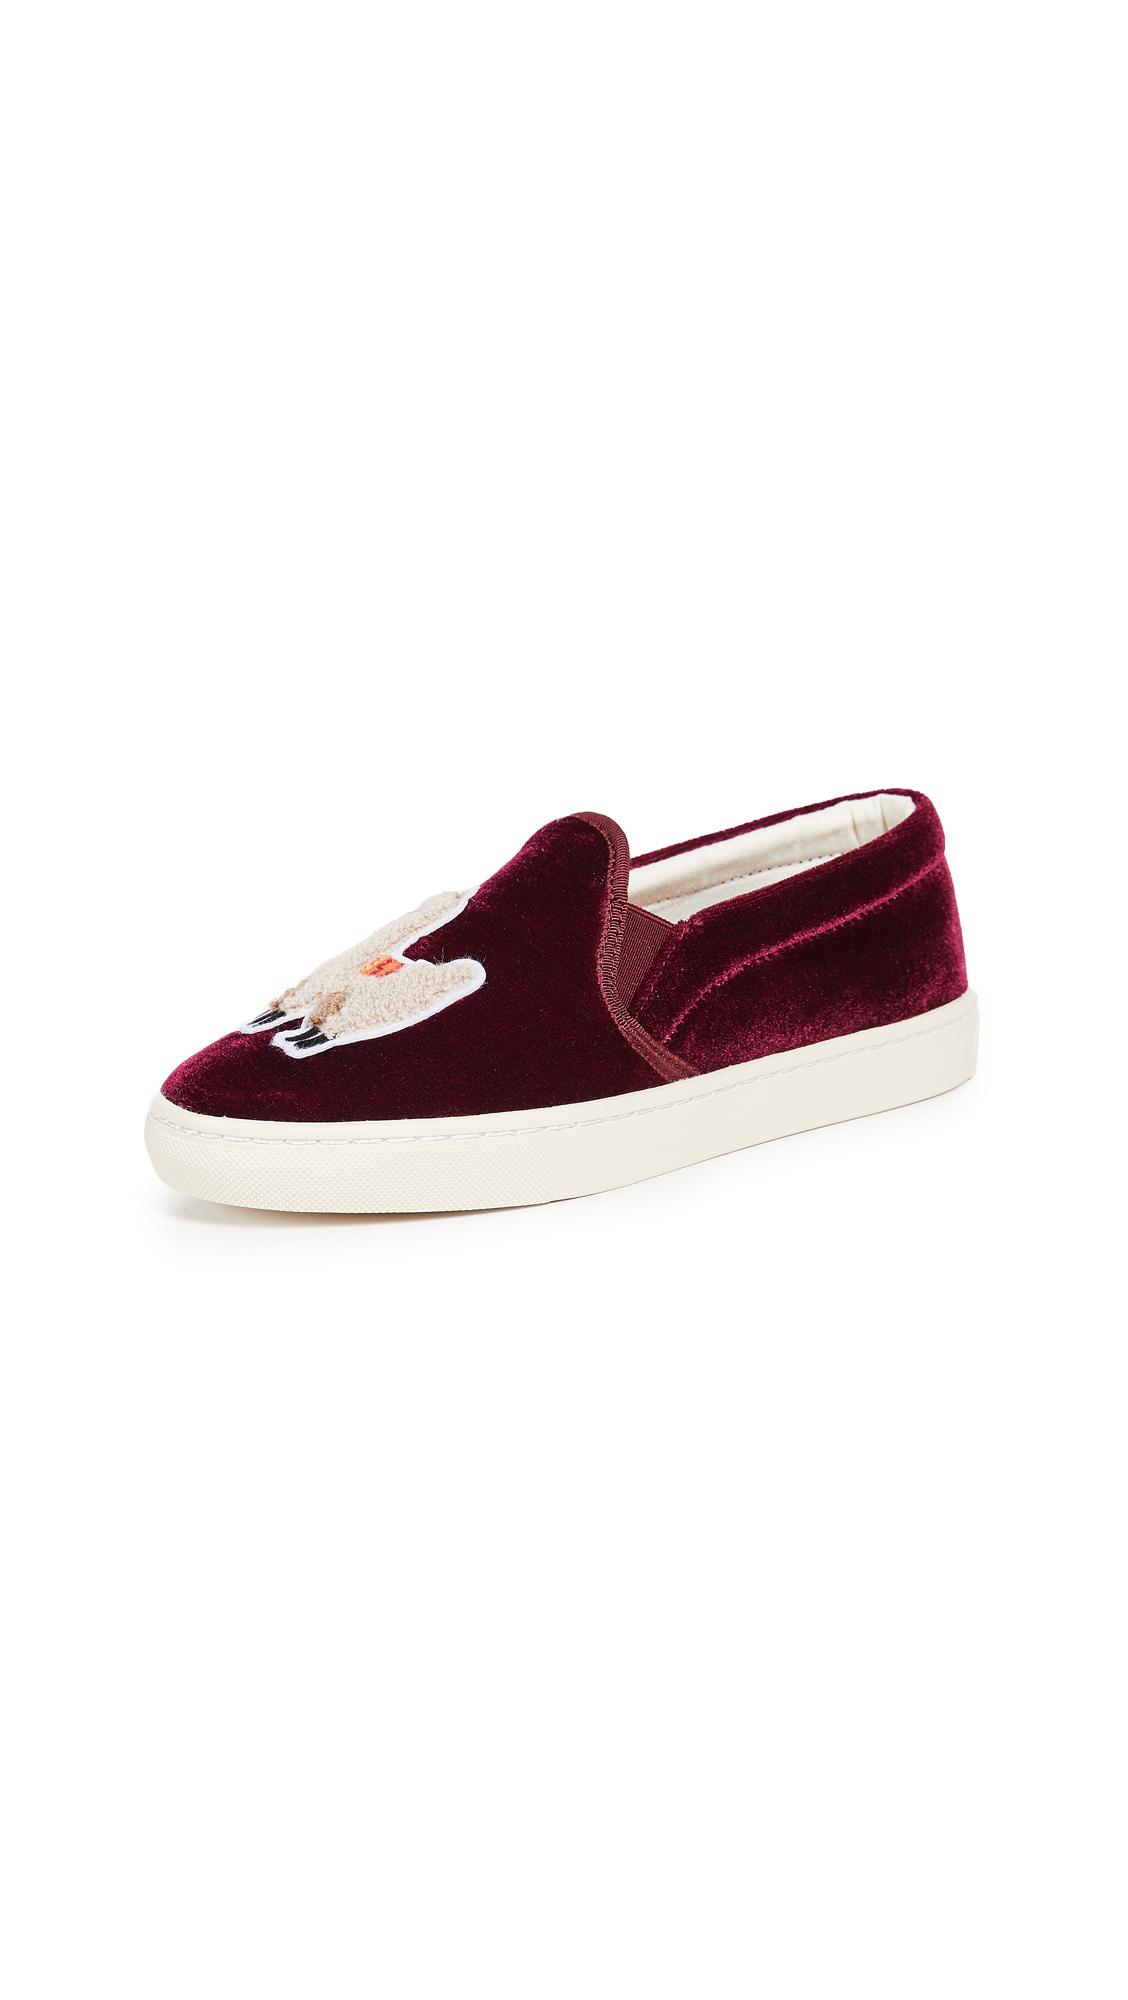 Soludos Velvet Llama Slip On Sneakers - Sangria